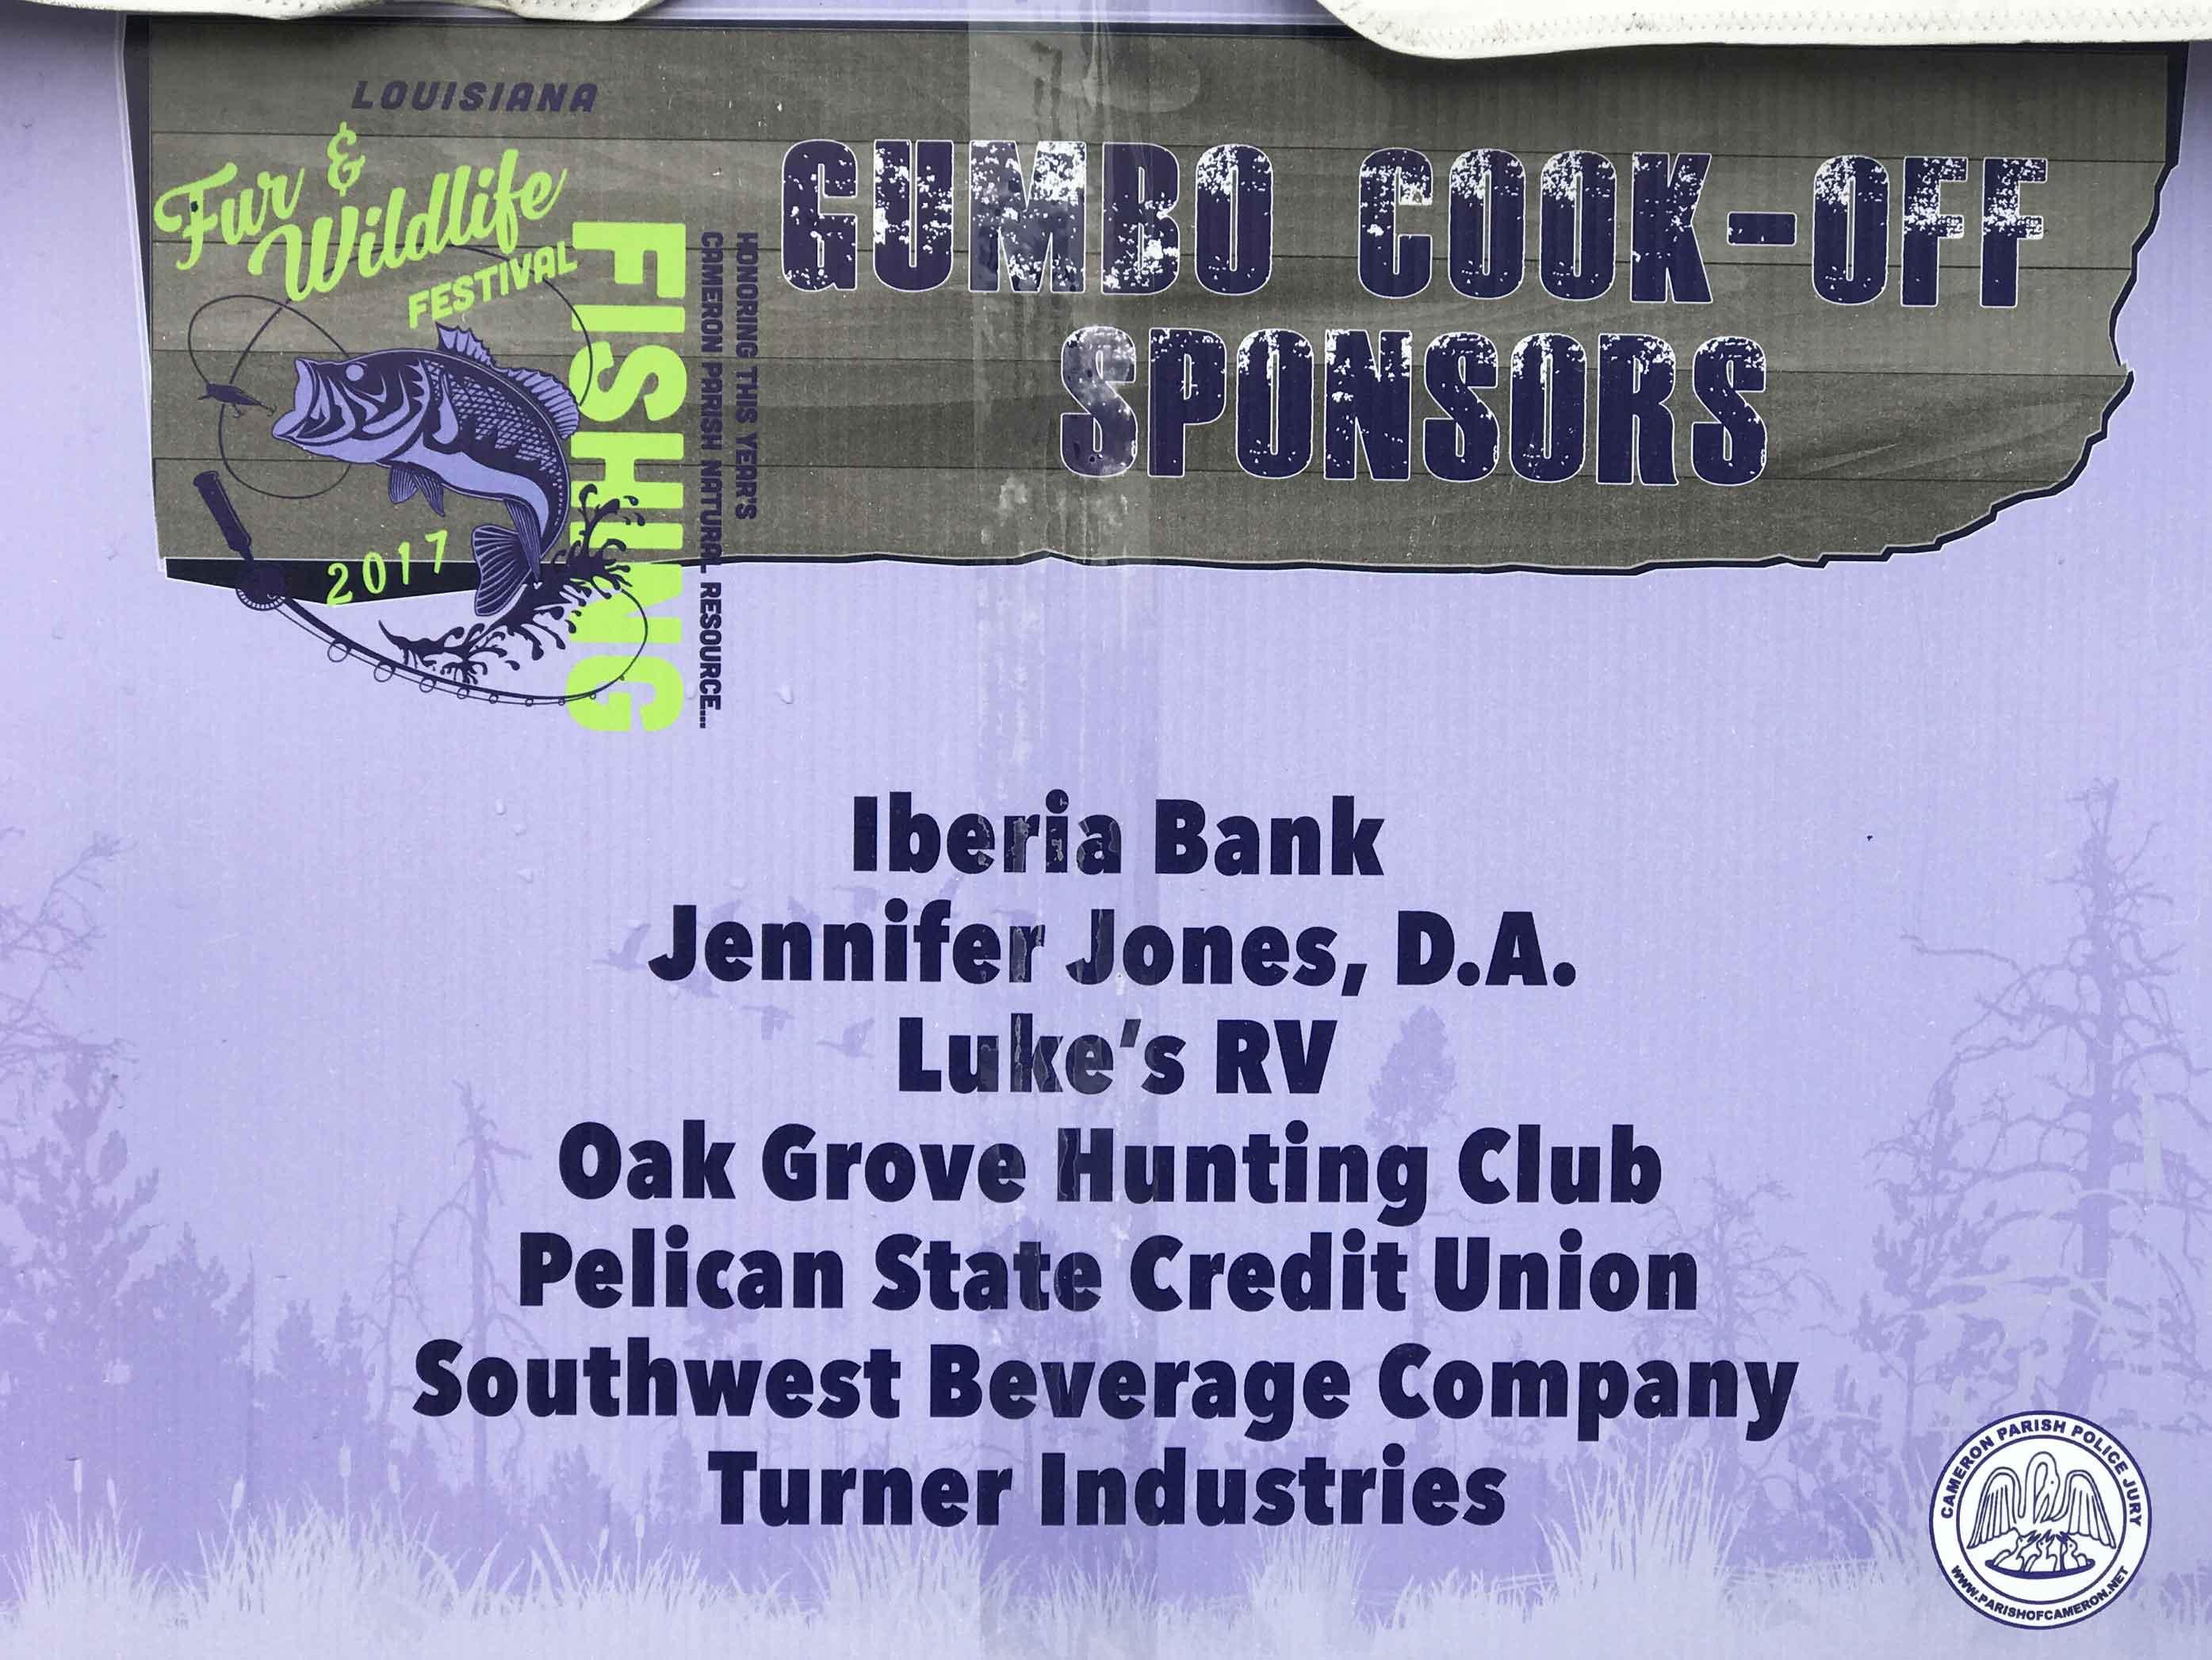 Spotlight On: Louisiana Fur and Wildlife Festival